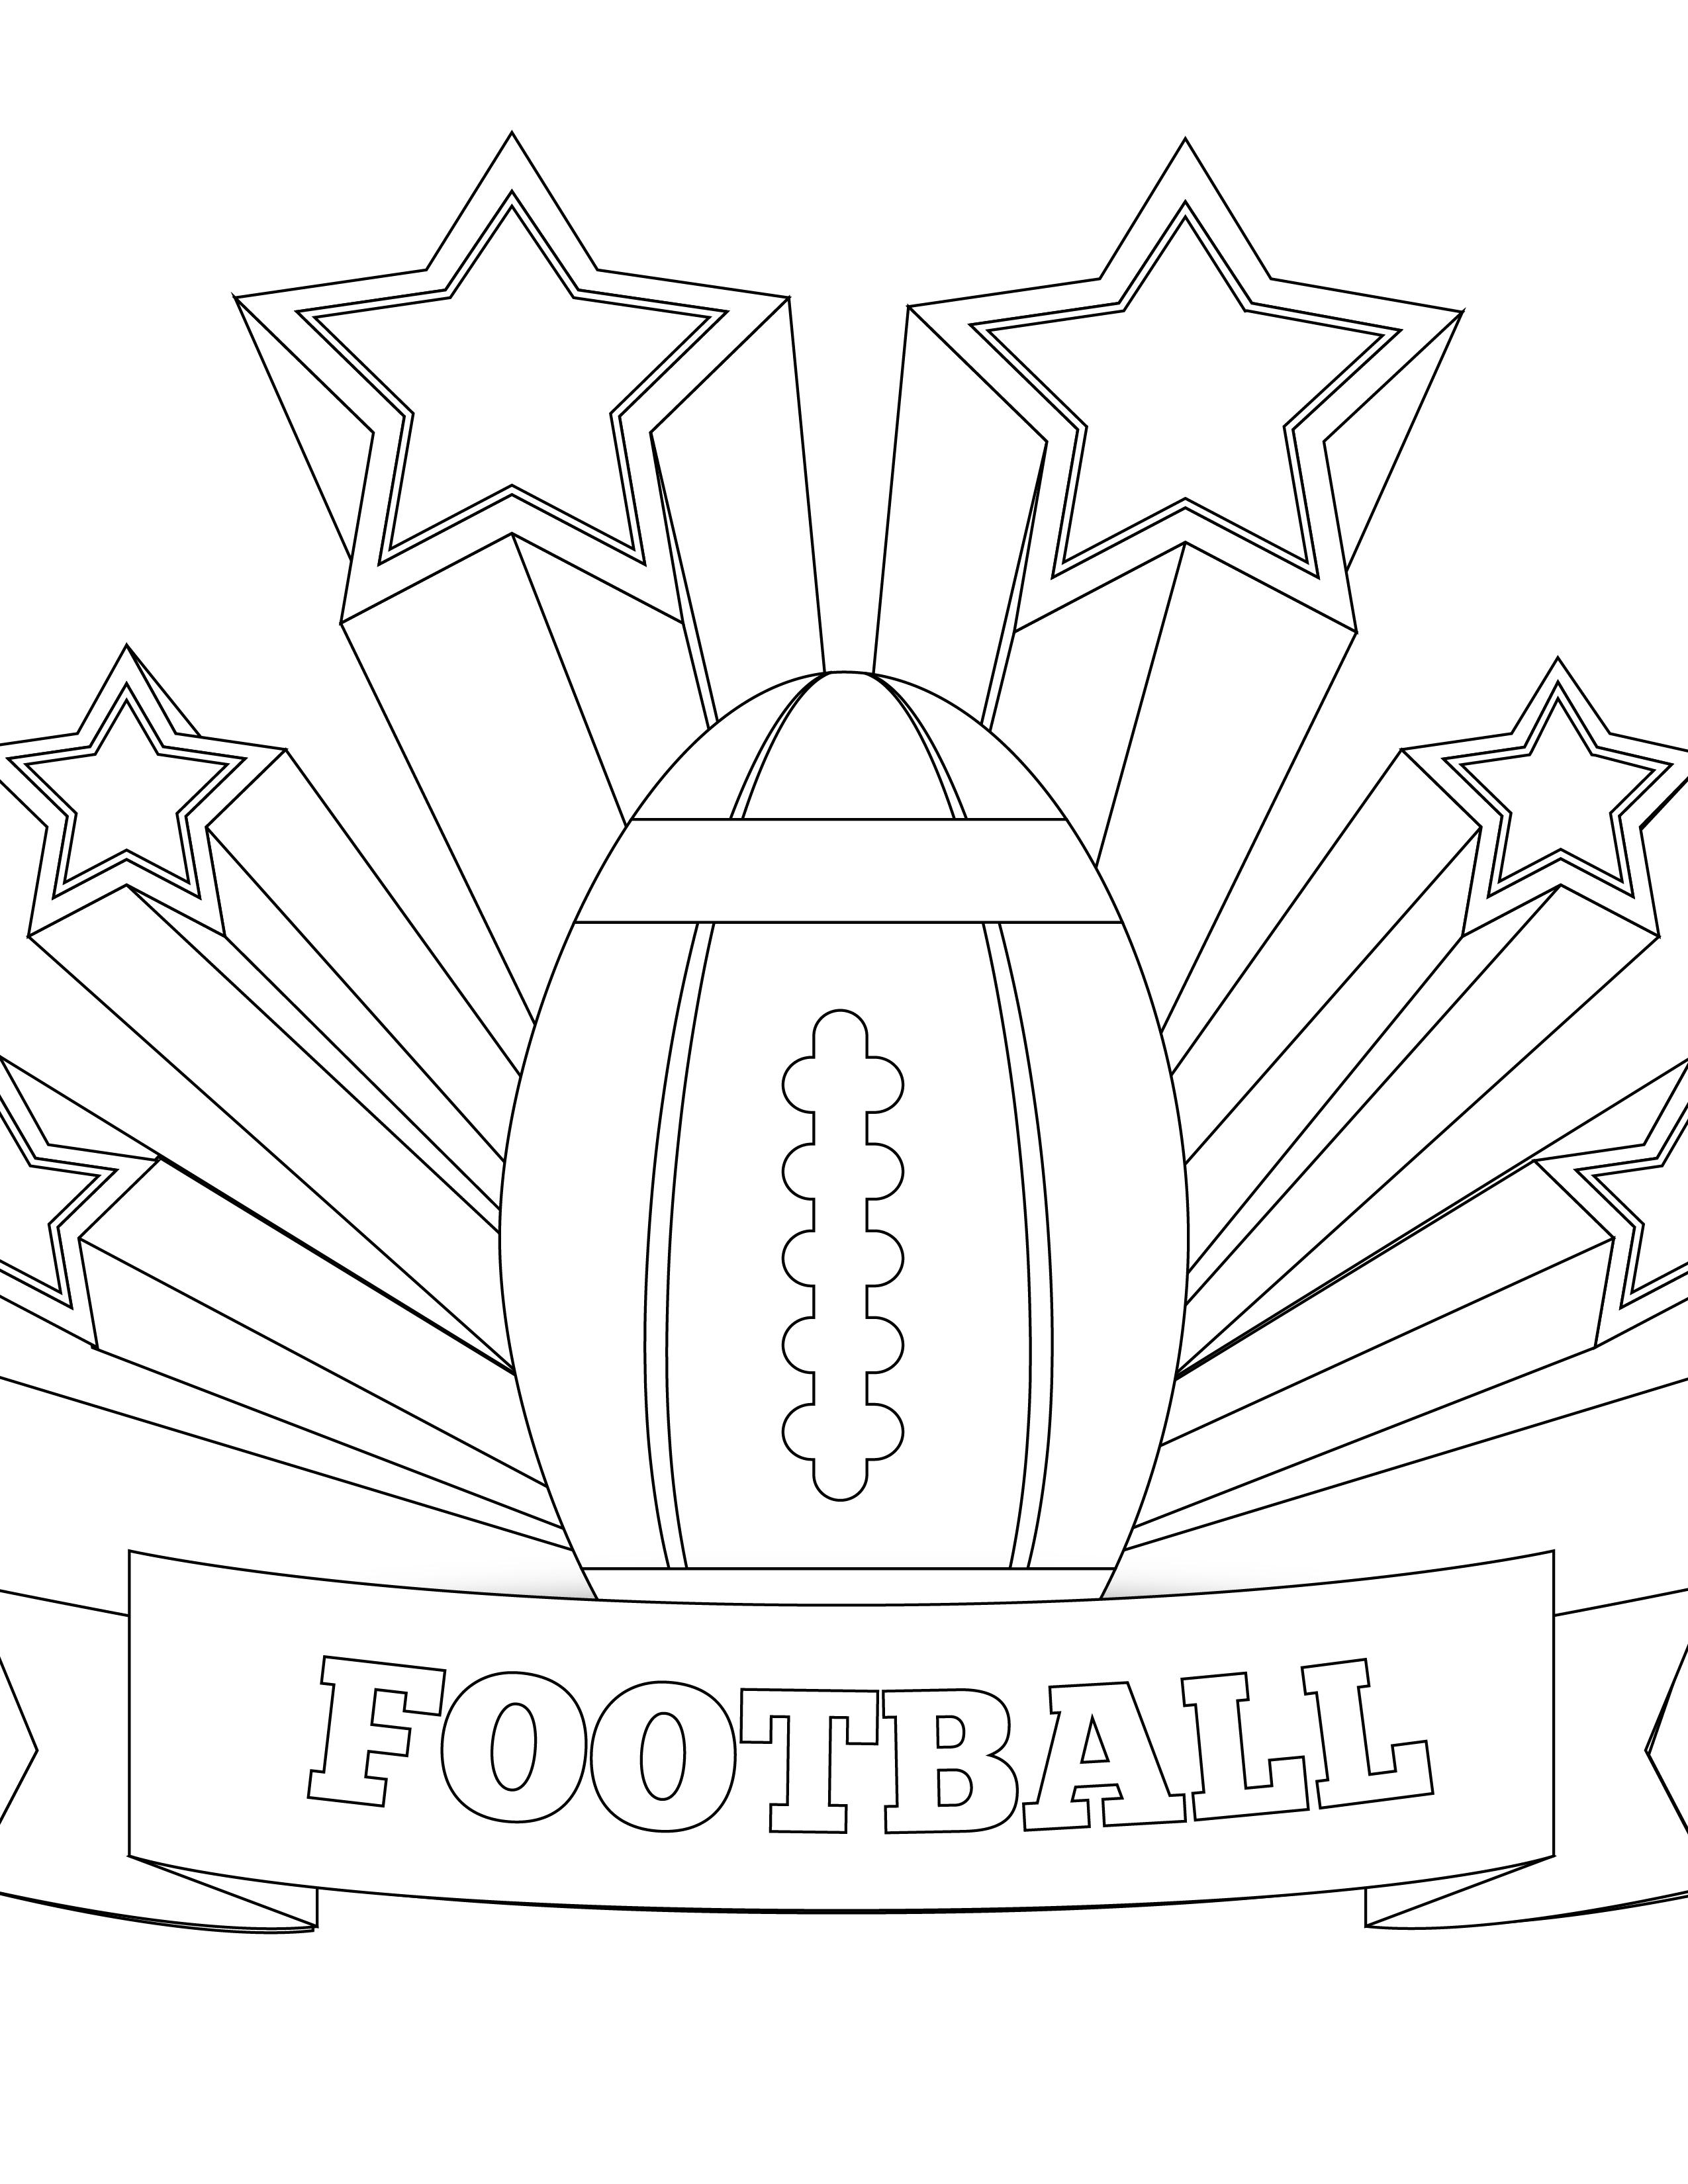 Coloriage de michigan state football - Dessin football americain ...